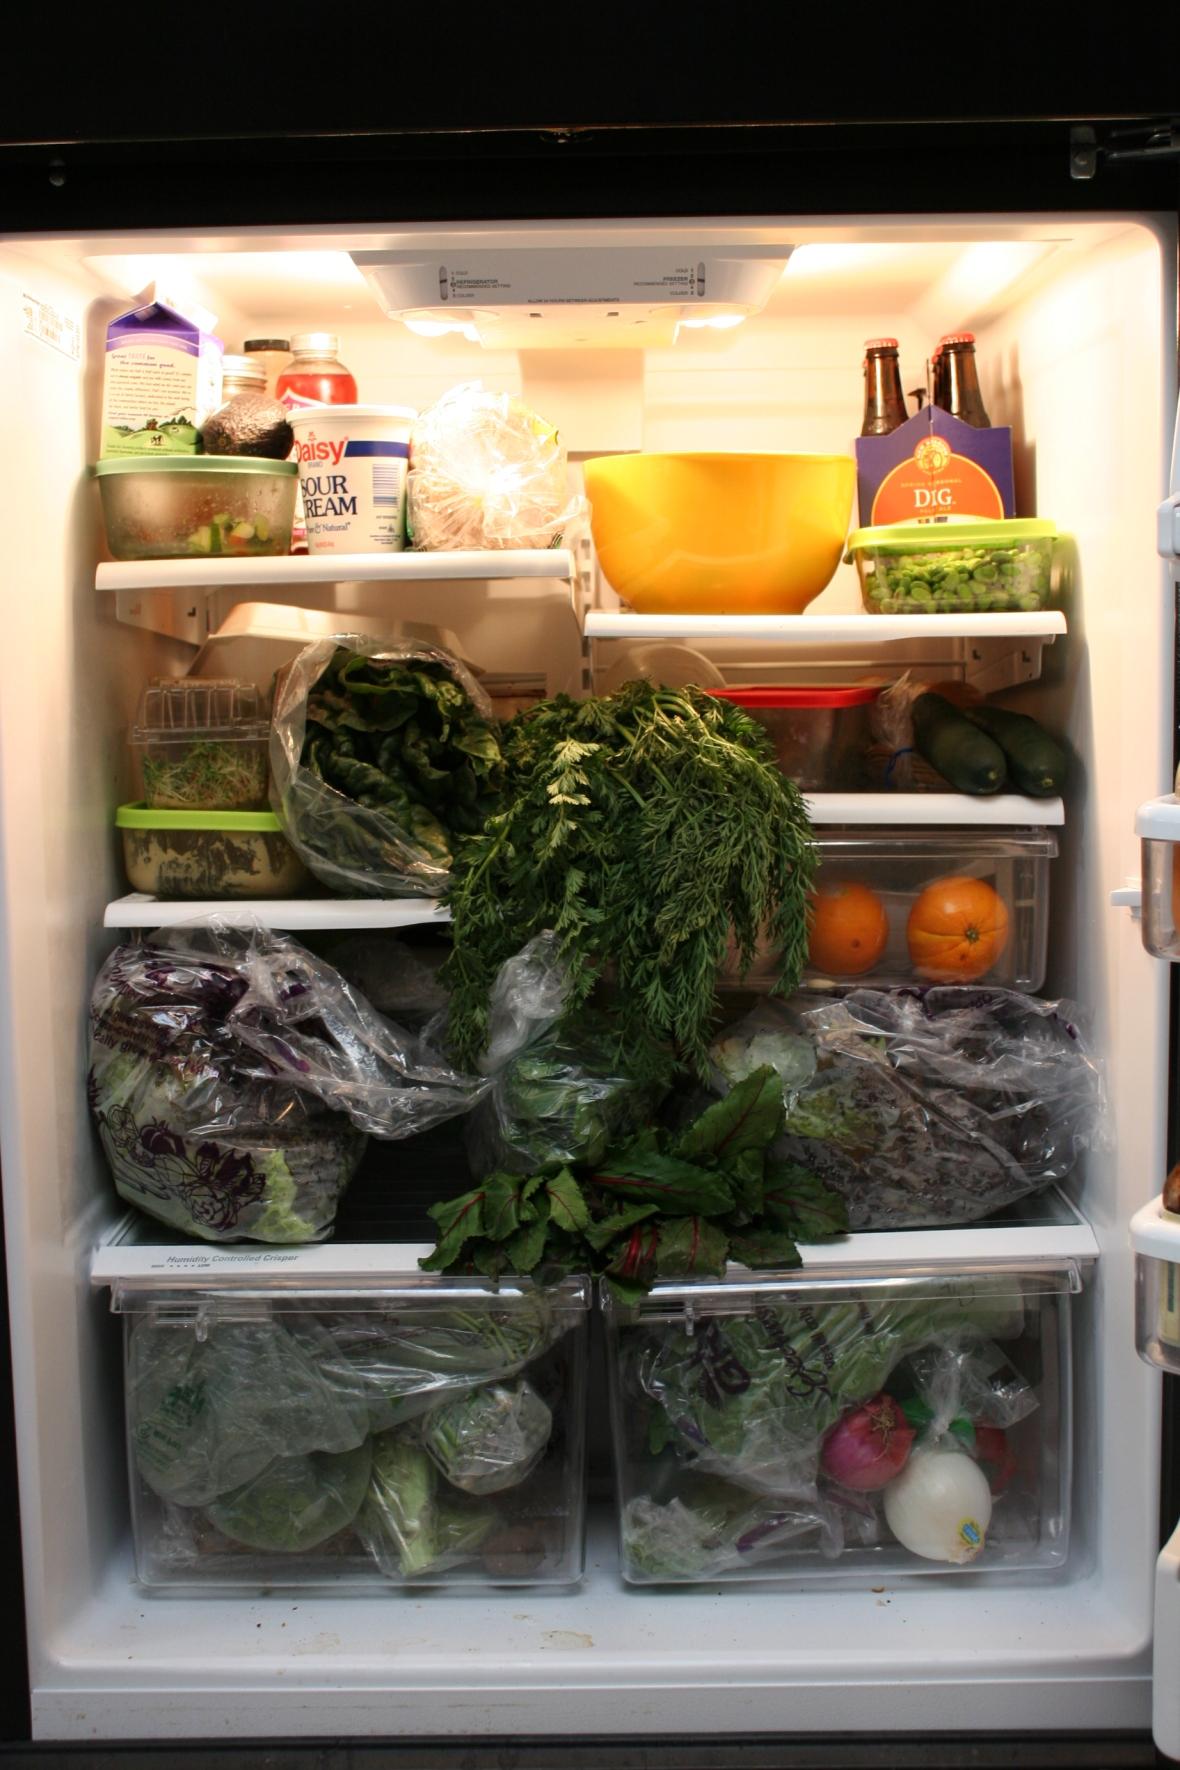 A vegetarian's refrigerator